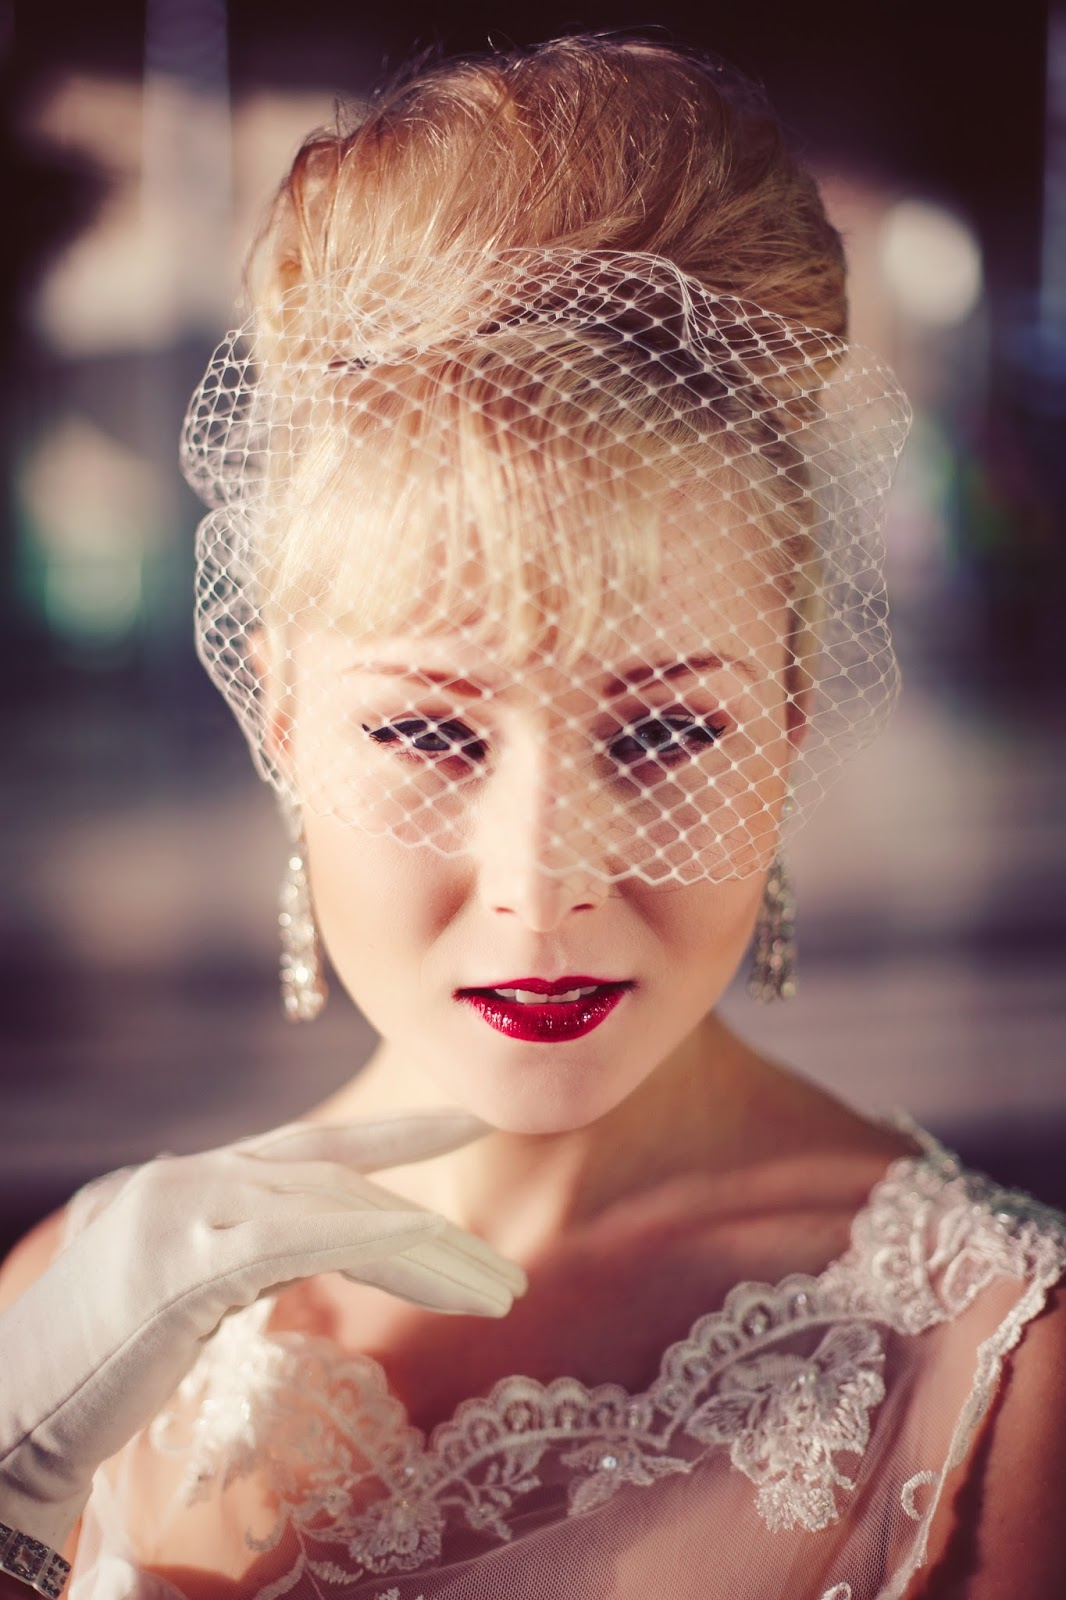 Be Bespoke Bridal Headpieces Ireland - 6 the birdcage veil